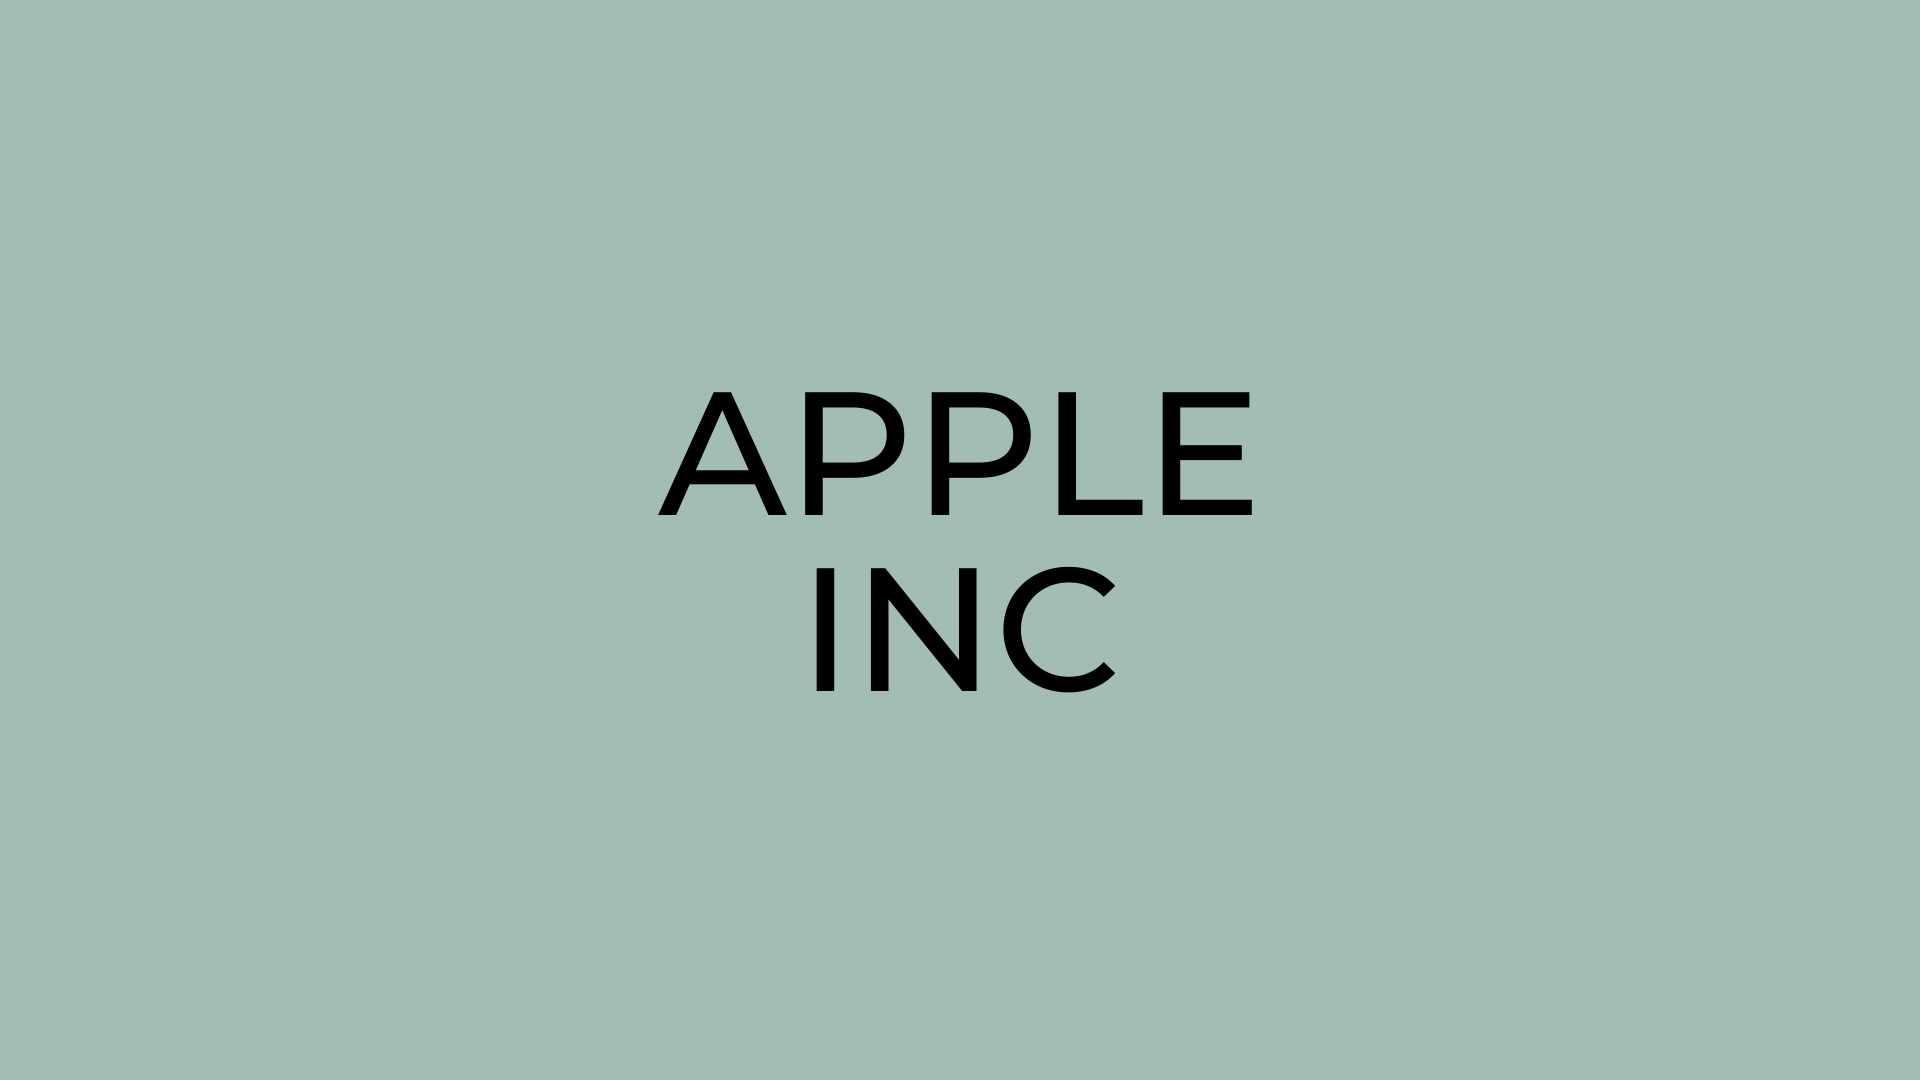 Apple Inc Apple stock price today